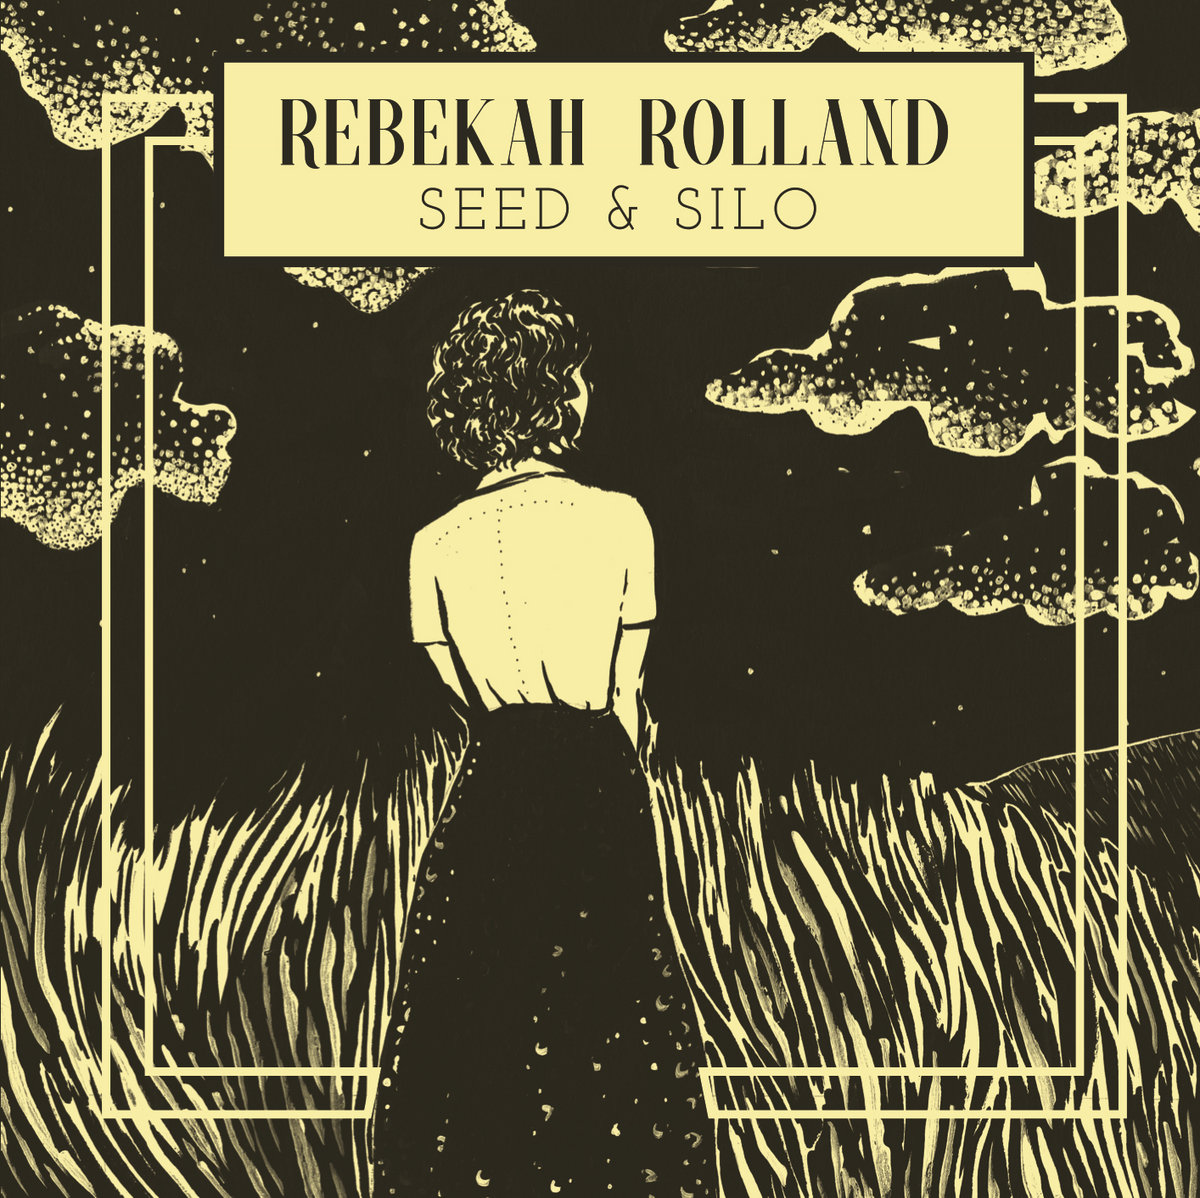 Seed & Silo | Rebekah Rolland